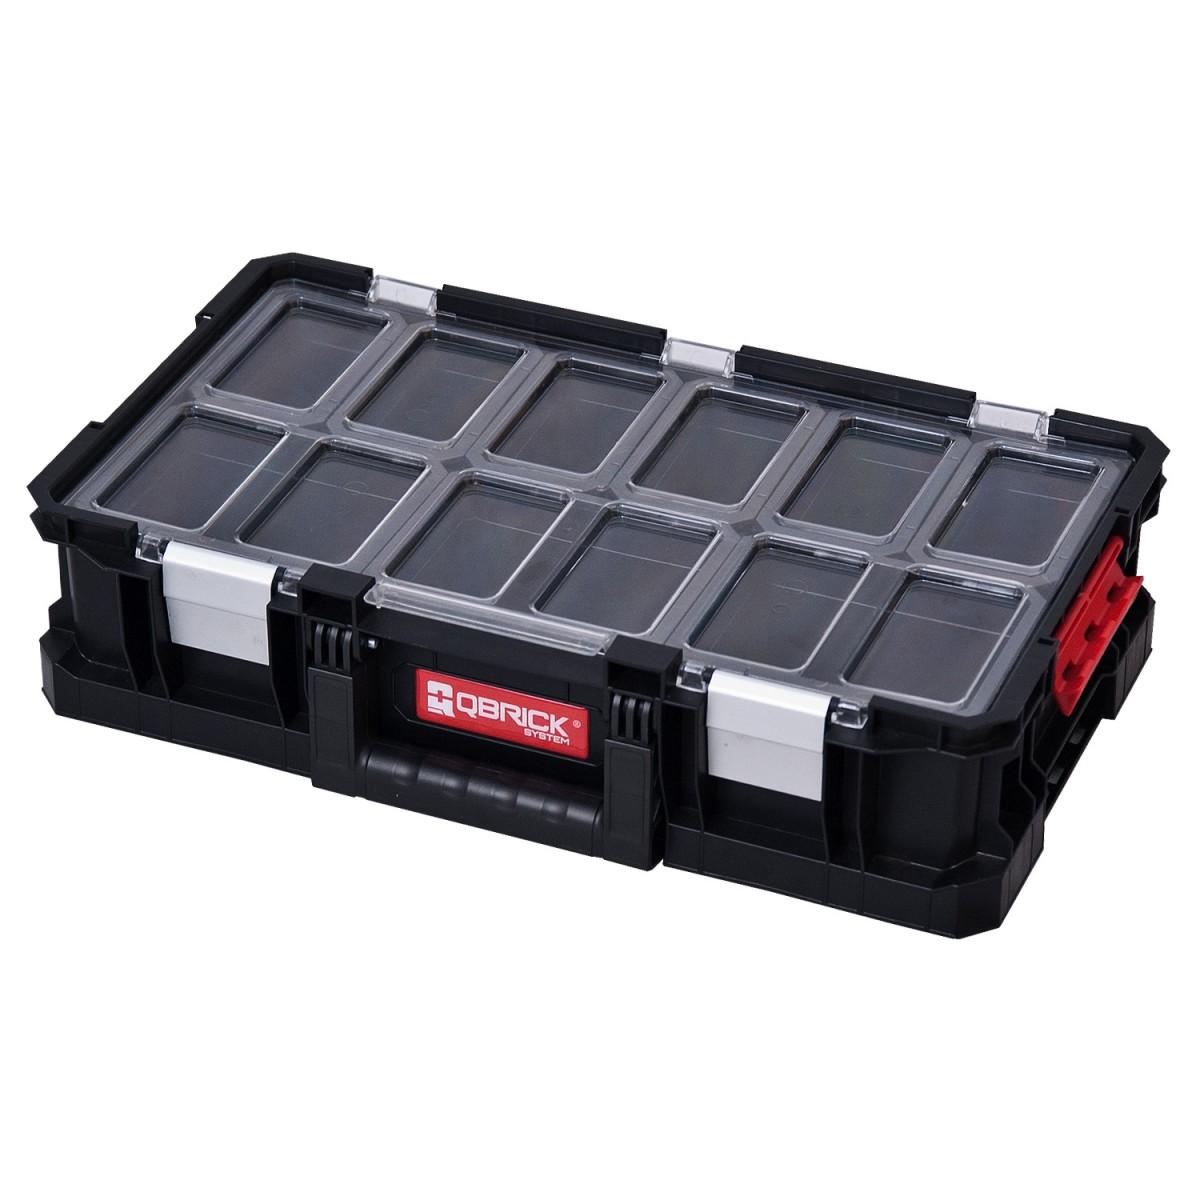 Kufr na nářadí Box QBRICK® System TWO Organizer Flex